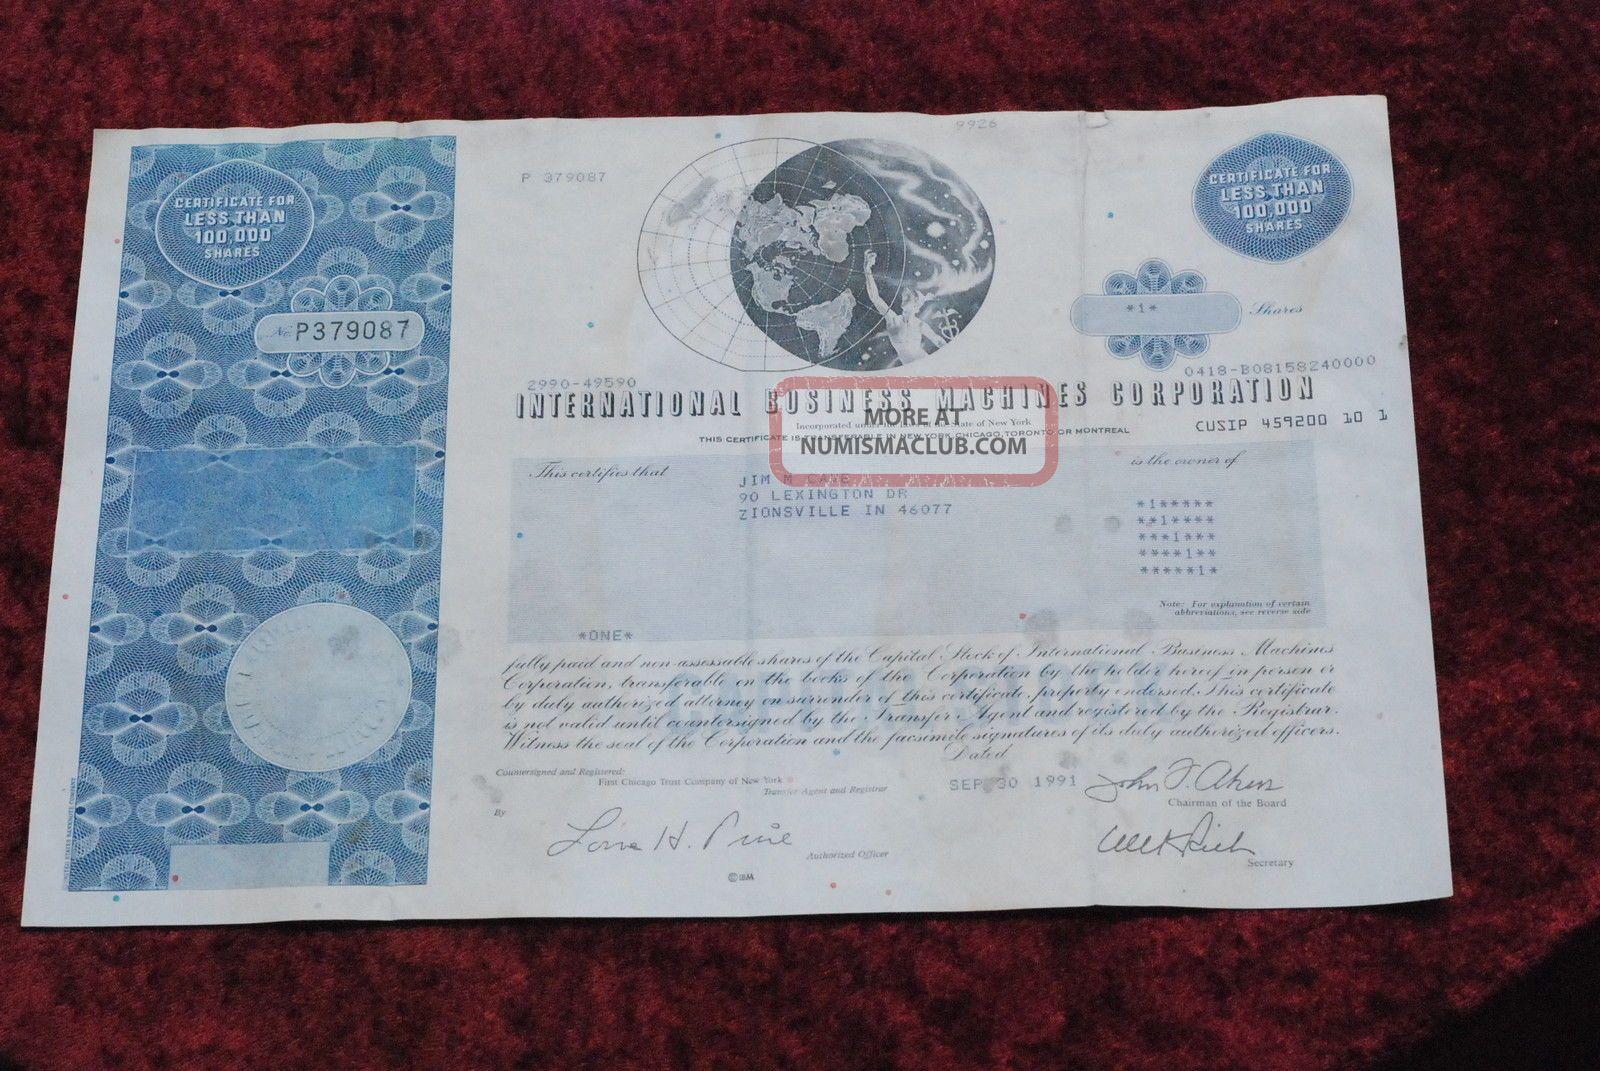 International Business Machines Common Share Stock Certificate Stocks & Bonds, Scripophily photo